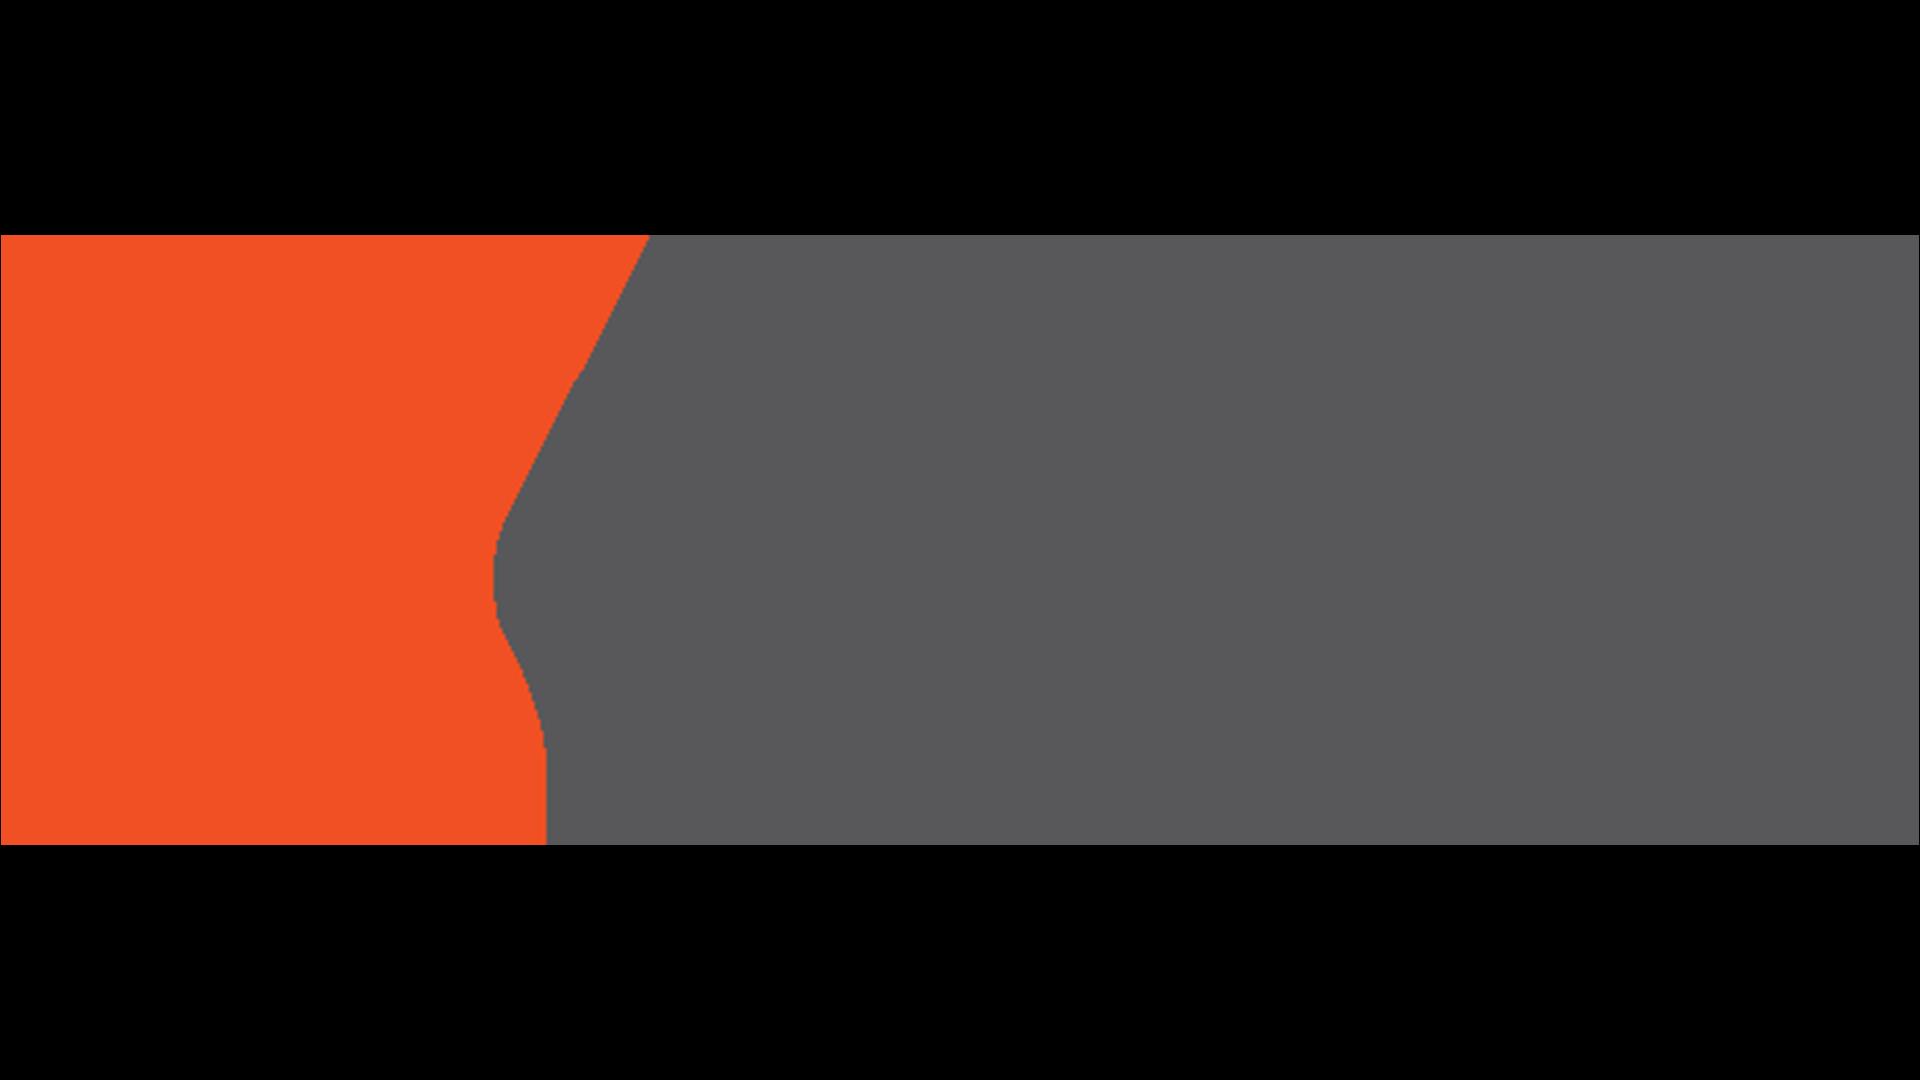 DASHMATE_WEB_LOGO